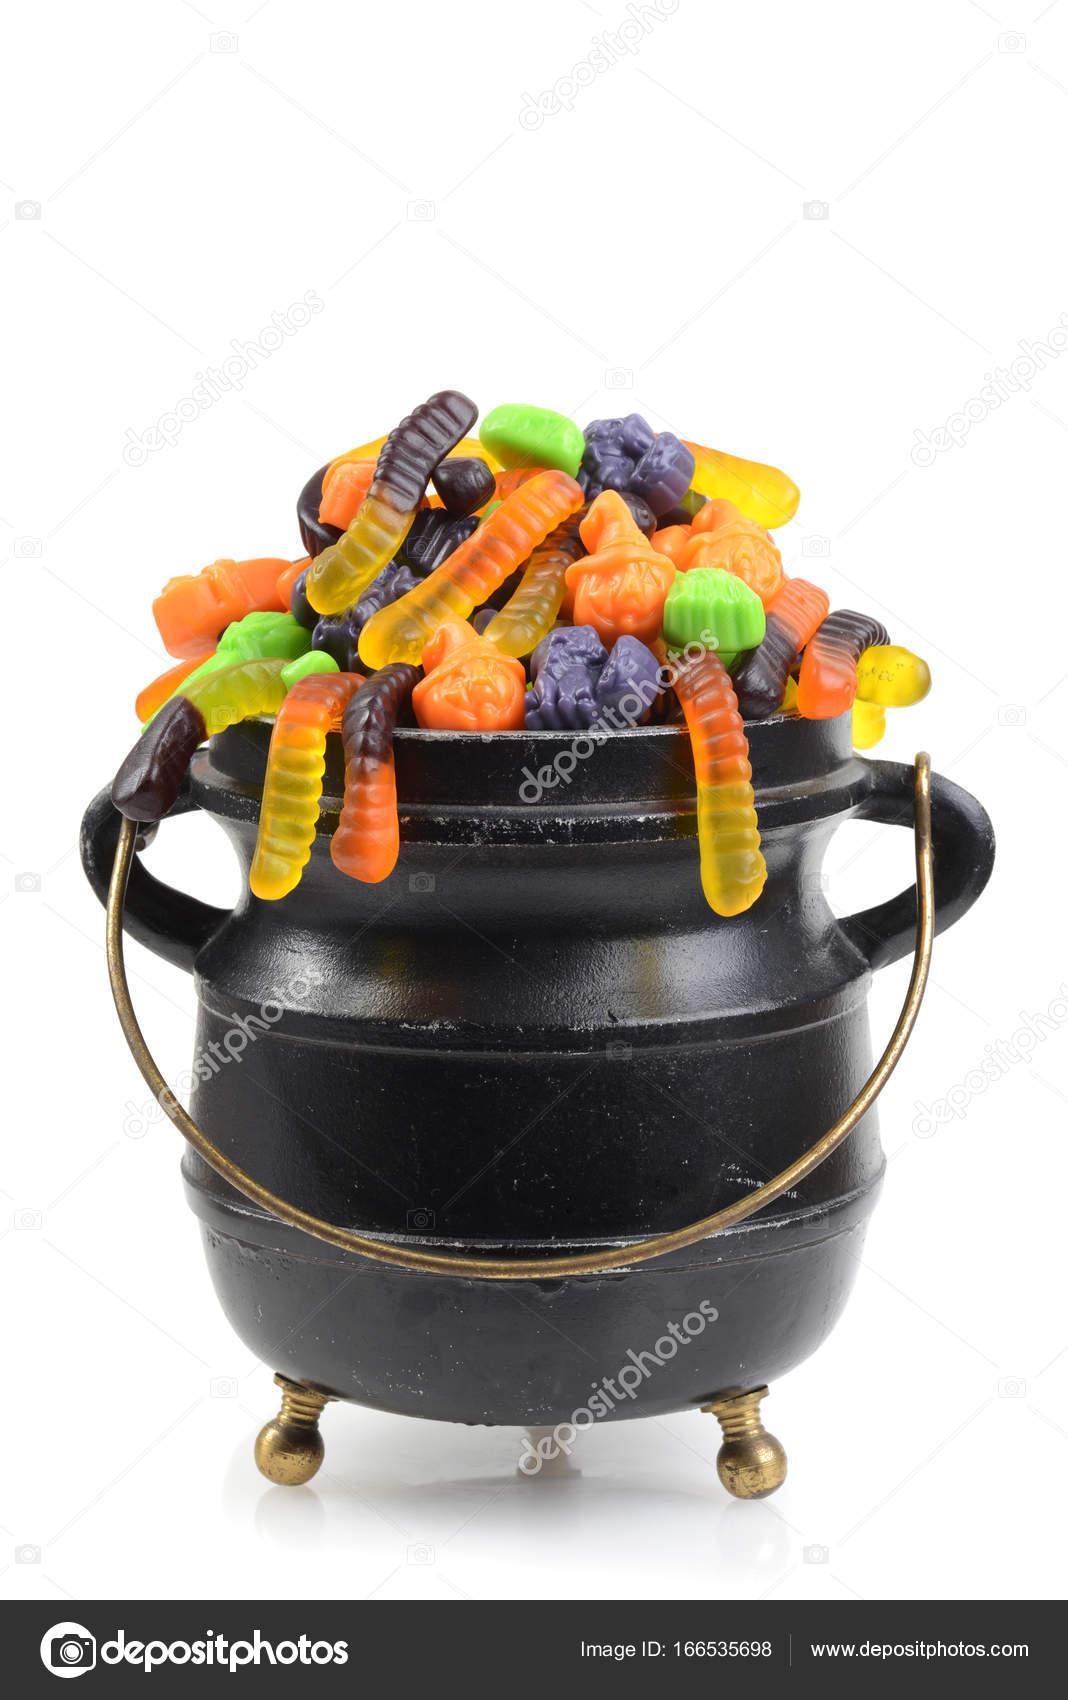 schwarze große Kessel, verschiedene Halloween-Süßigkeiten ...